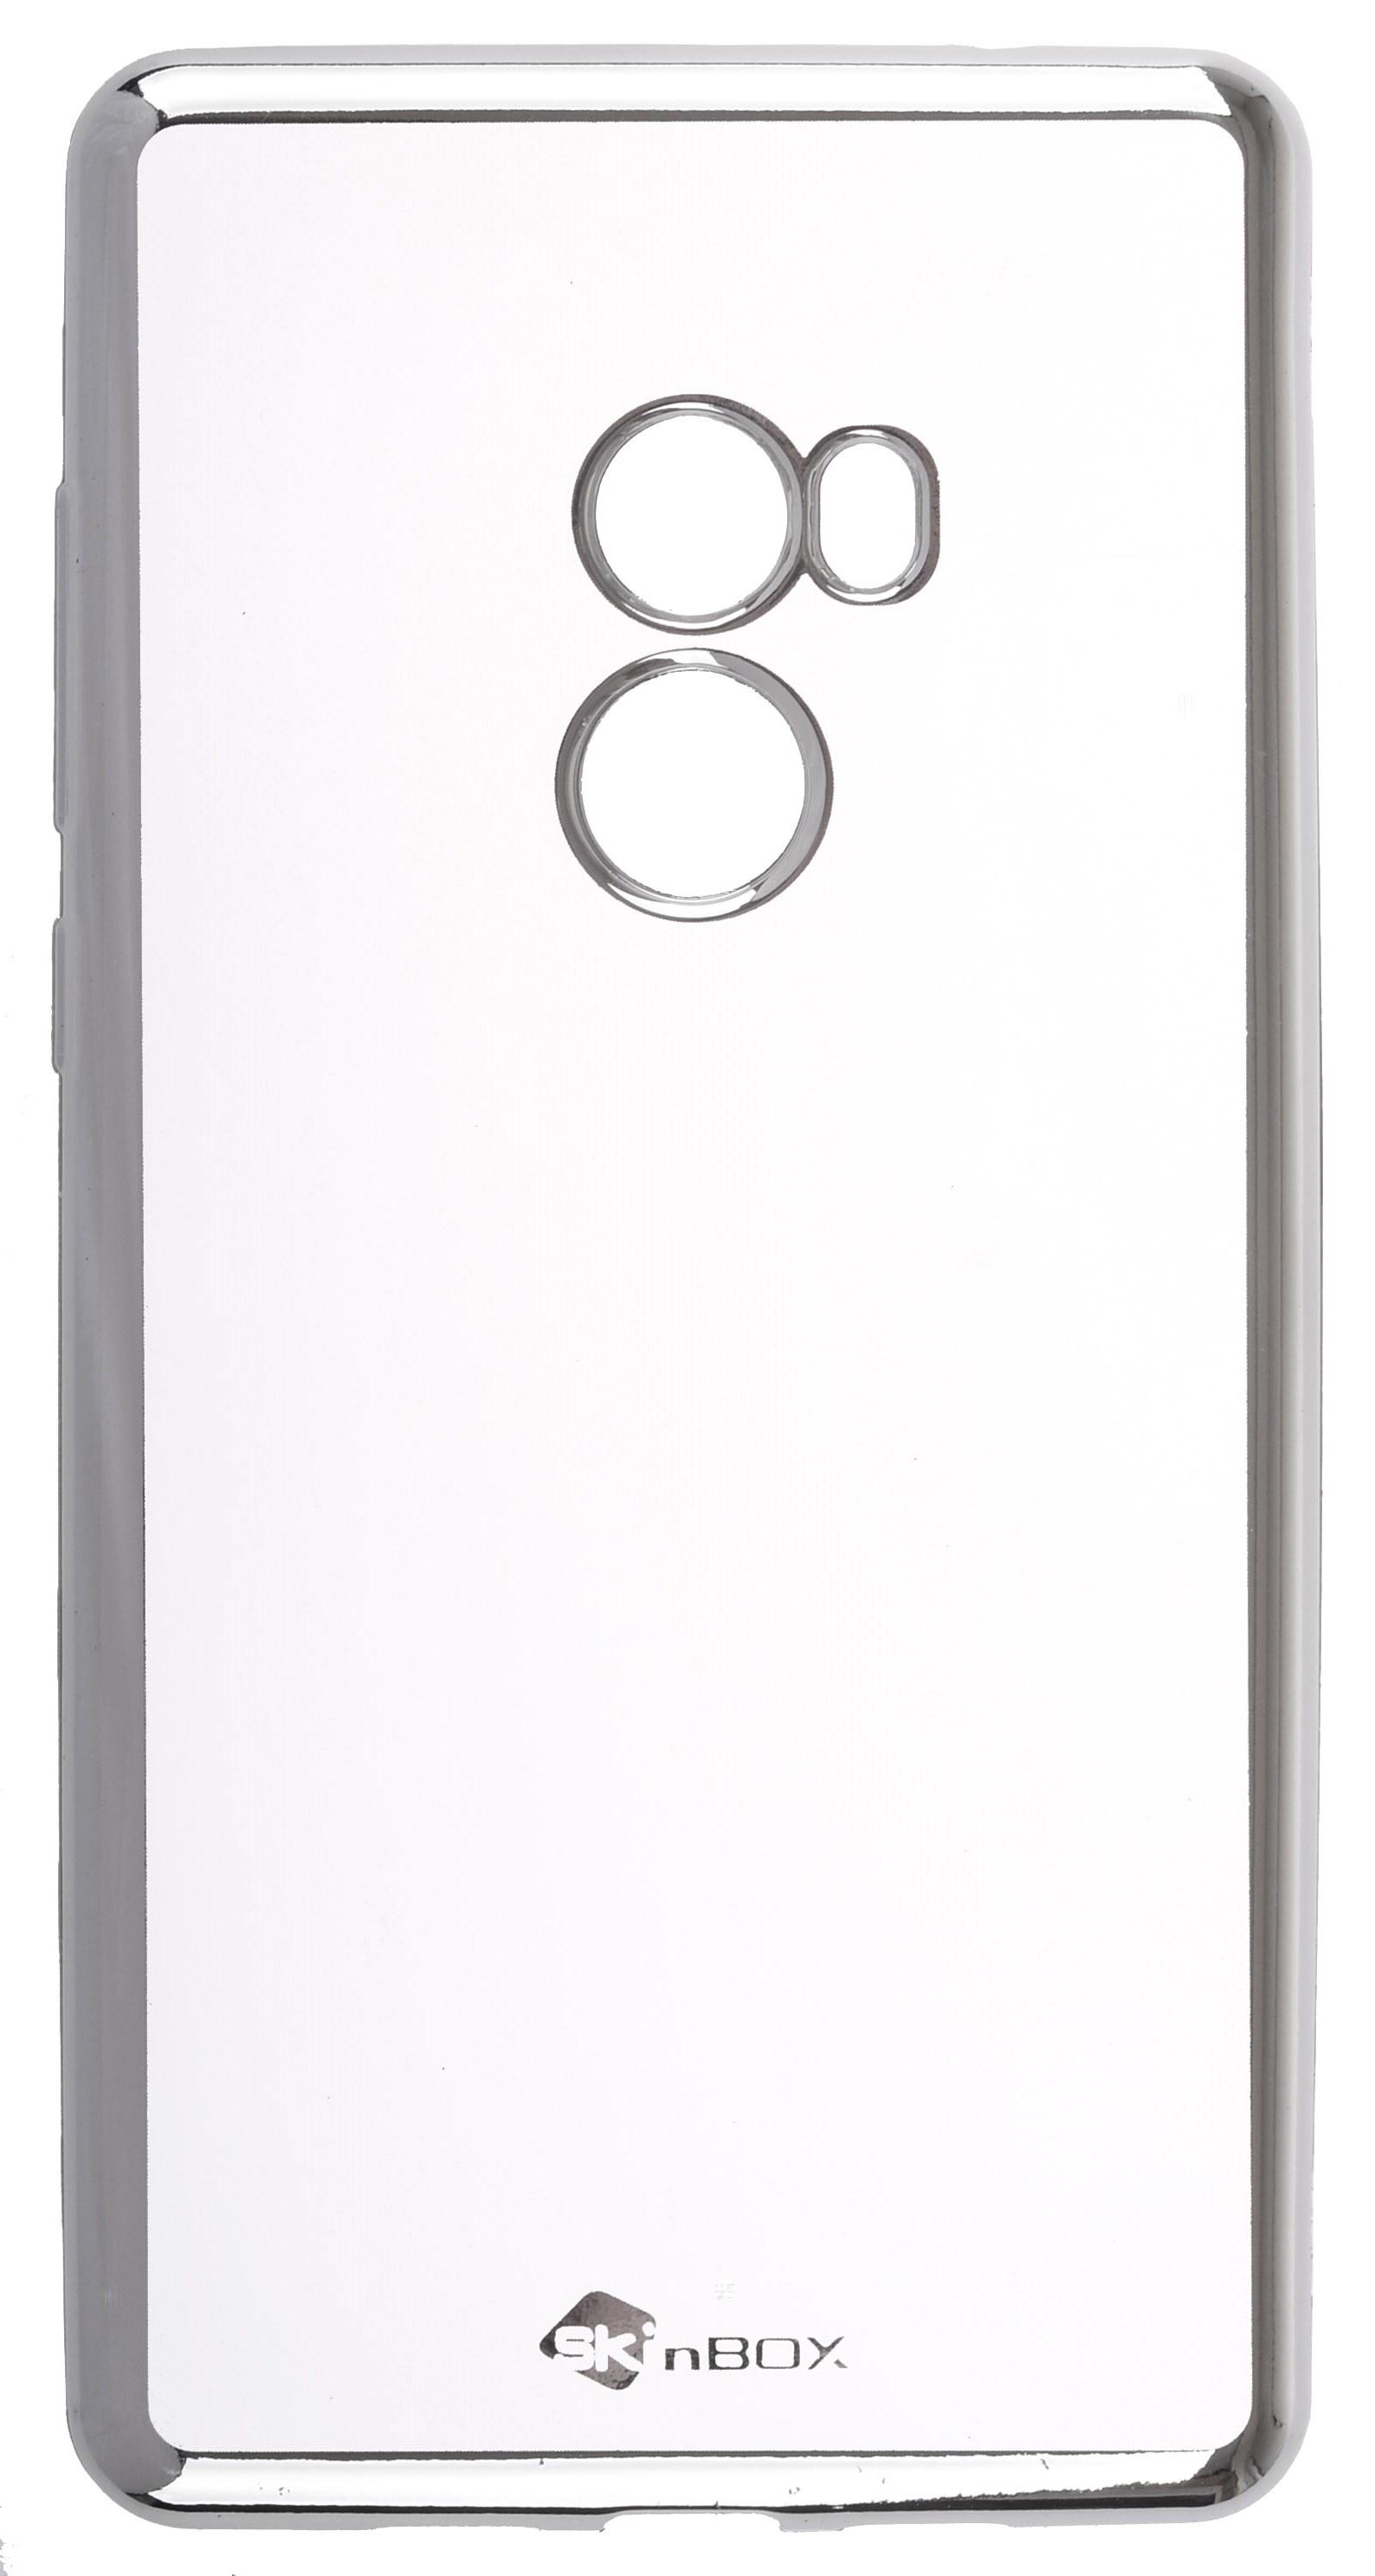 Чехол для сотового телефона skinBOX Silicone chrome border, 4630042524408, серебристый чехол для сотового телефона skinbox silicone chrome border 4630042524514 серебристый